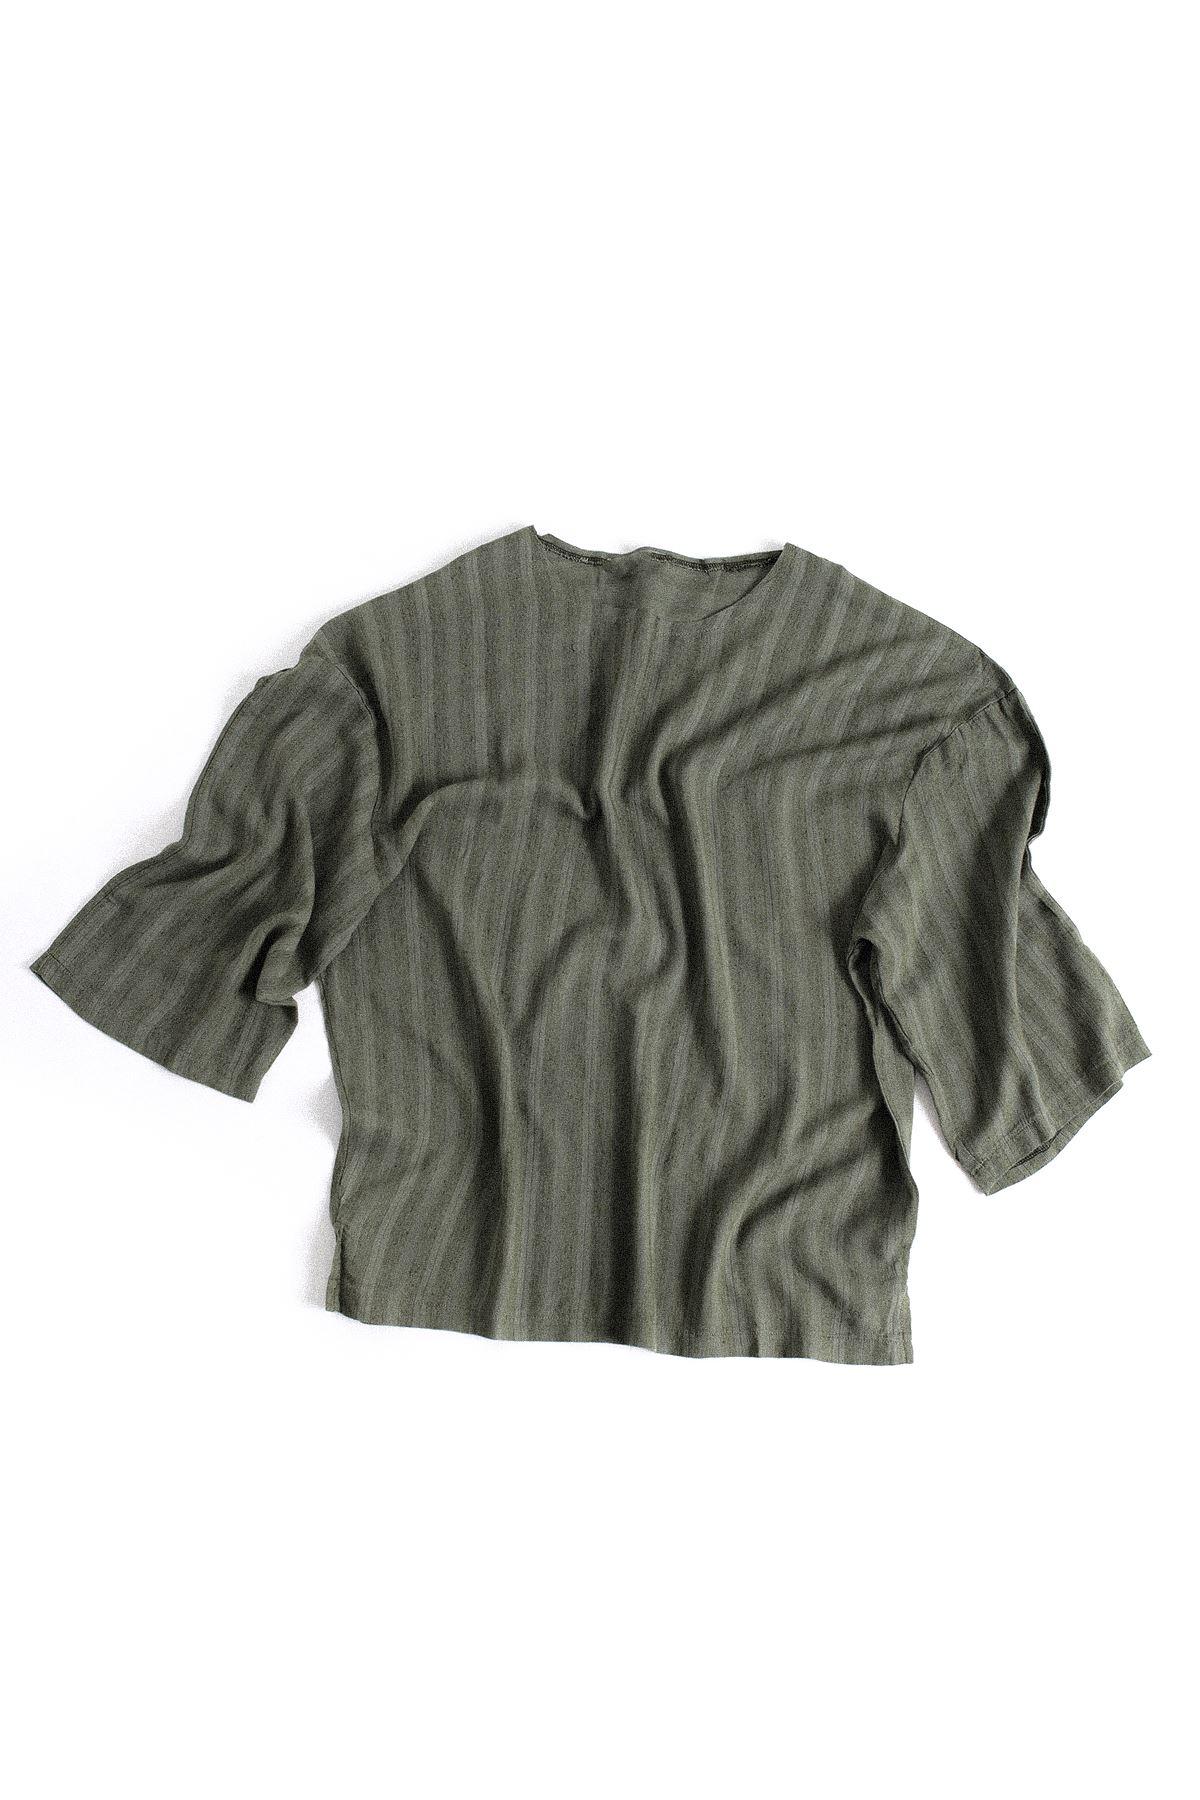 Haki Fakir Kol Oversize Viskon Keten T-Shirt